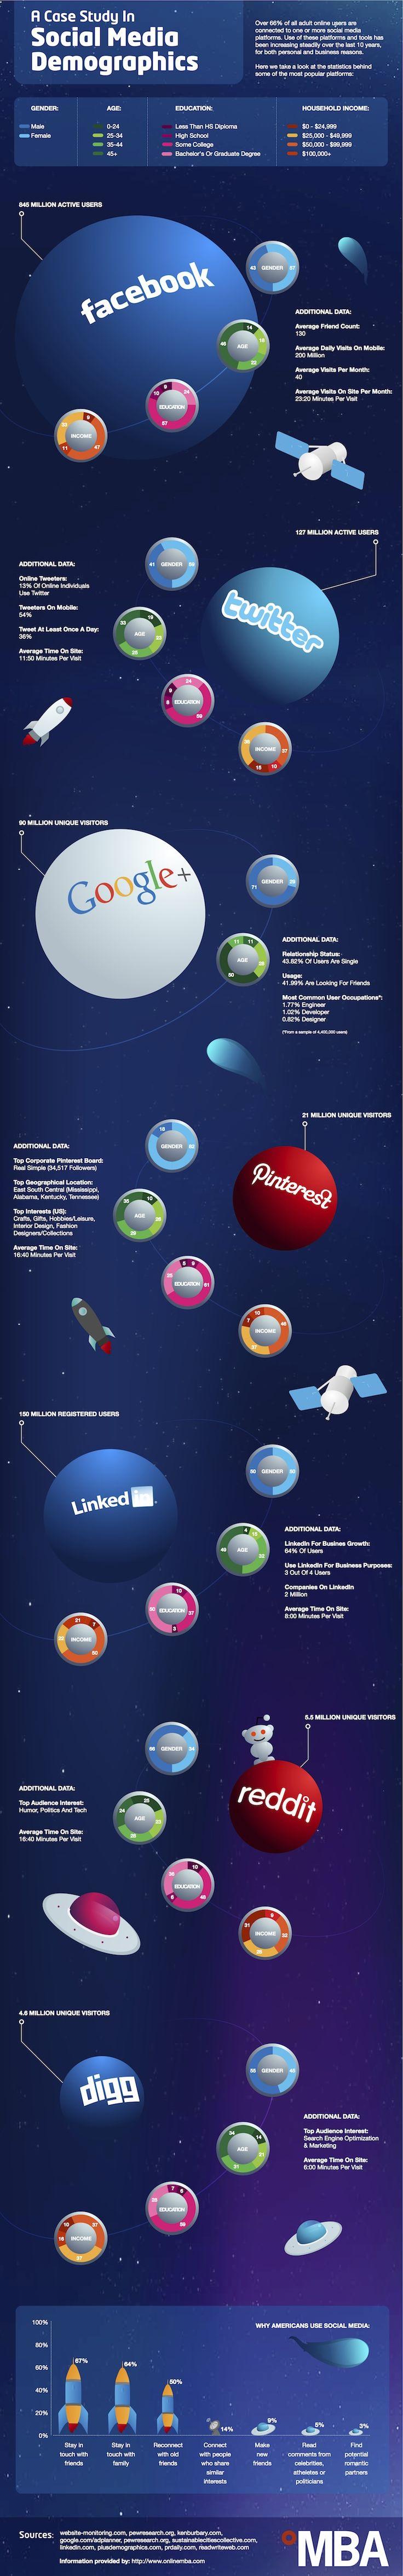 Facebook, Twitter, Reddit, Pinterest - a case study in social media demographics